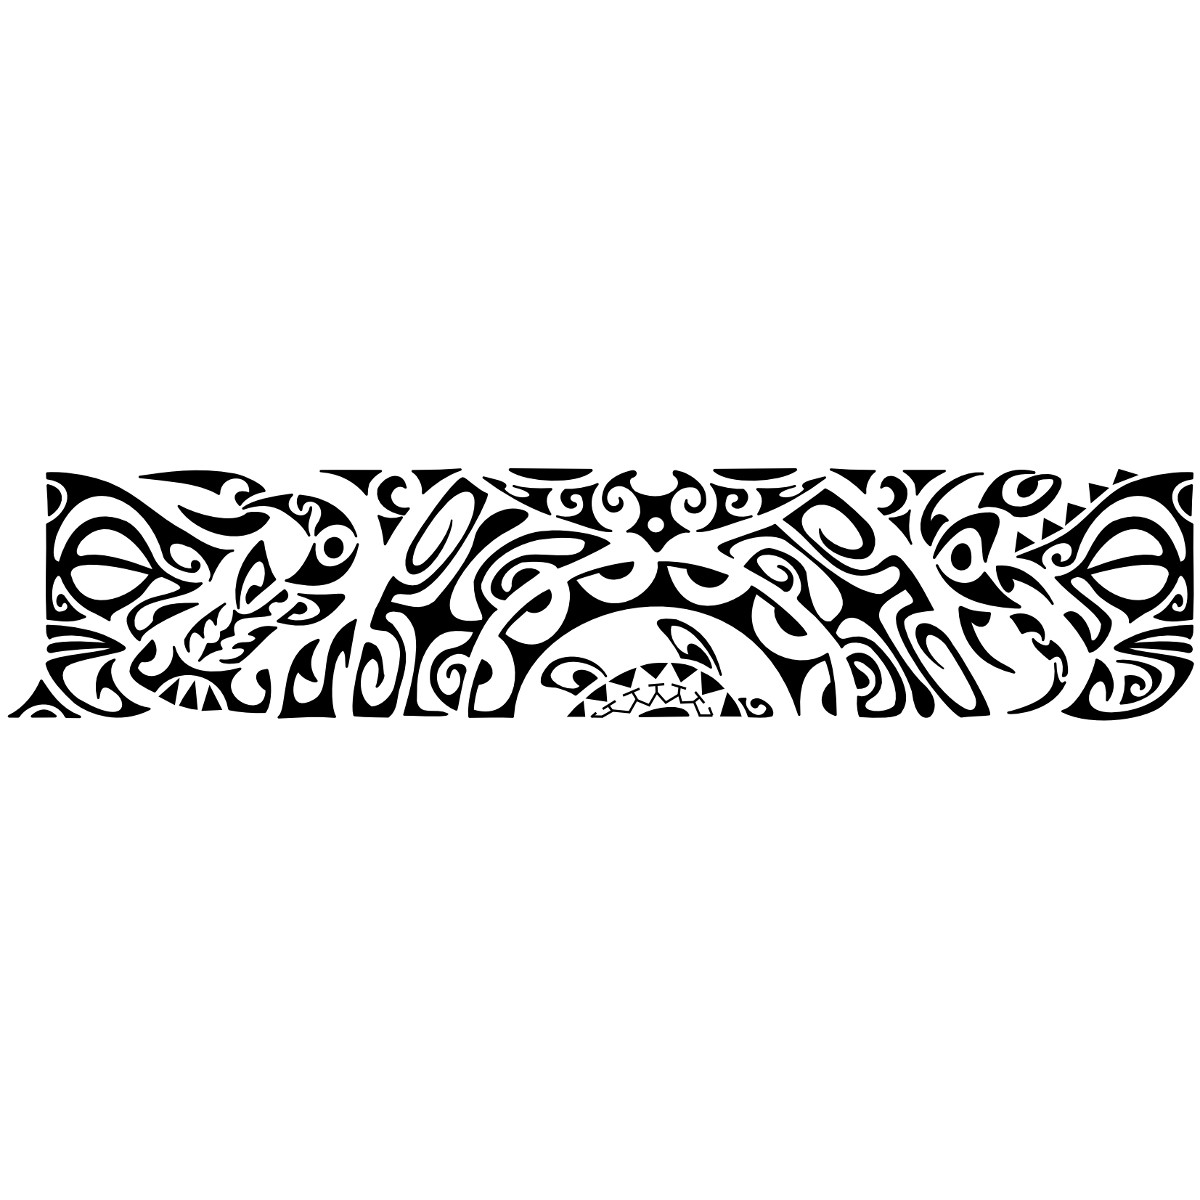 Maori Tattoo Armband: 8 Awesome Armband Tattoo Designs